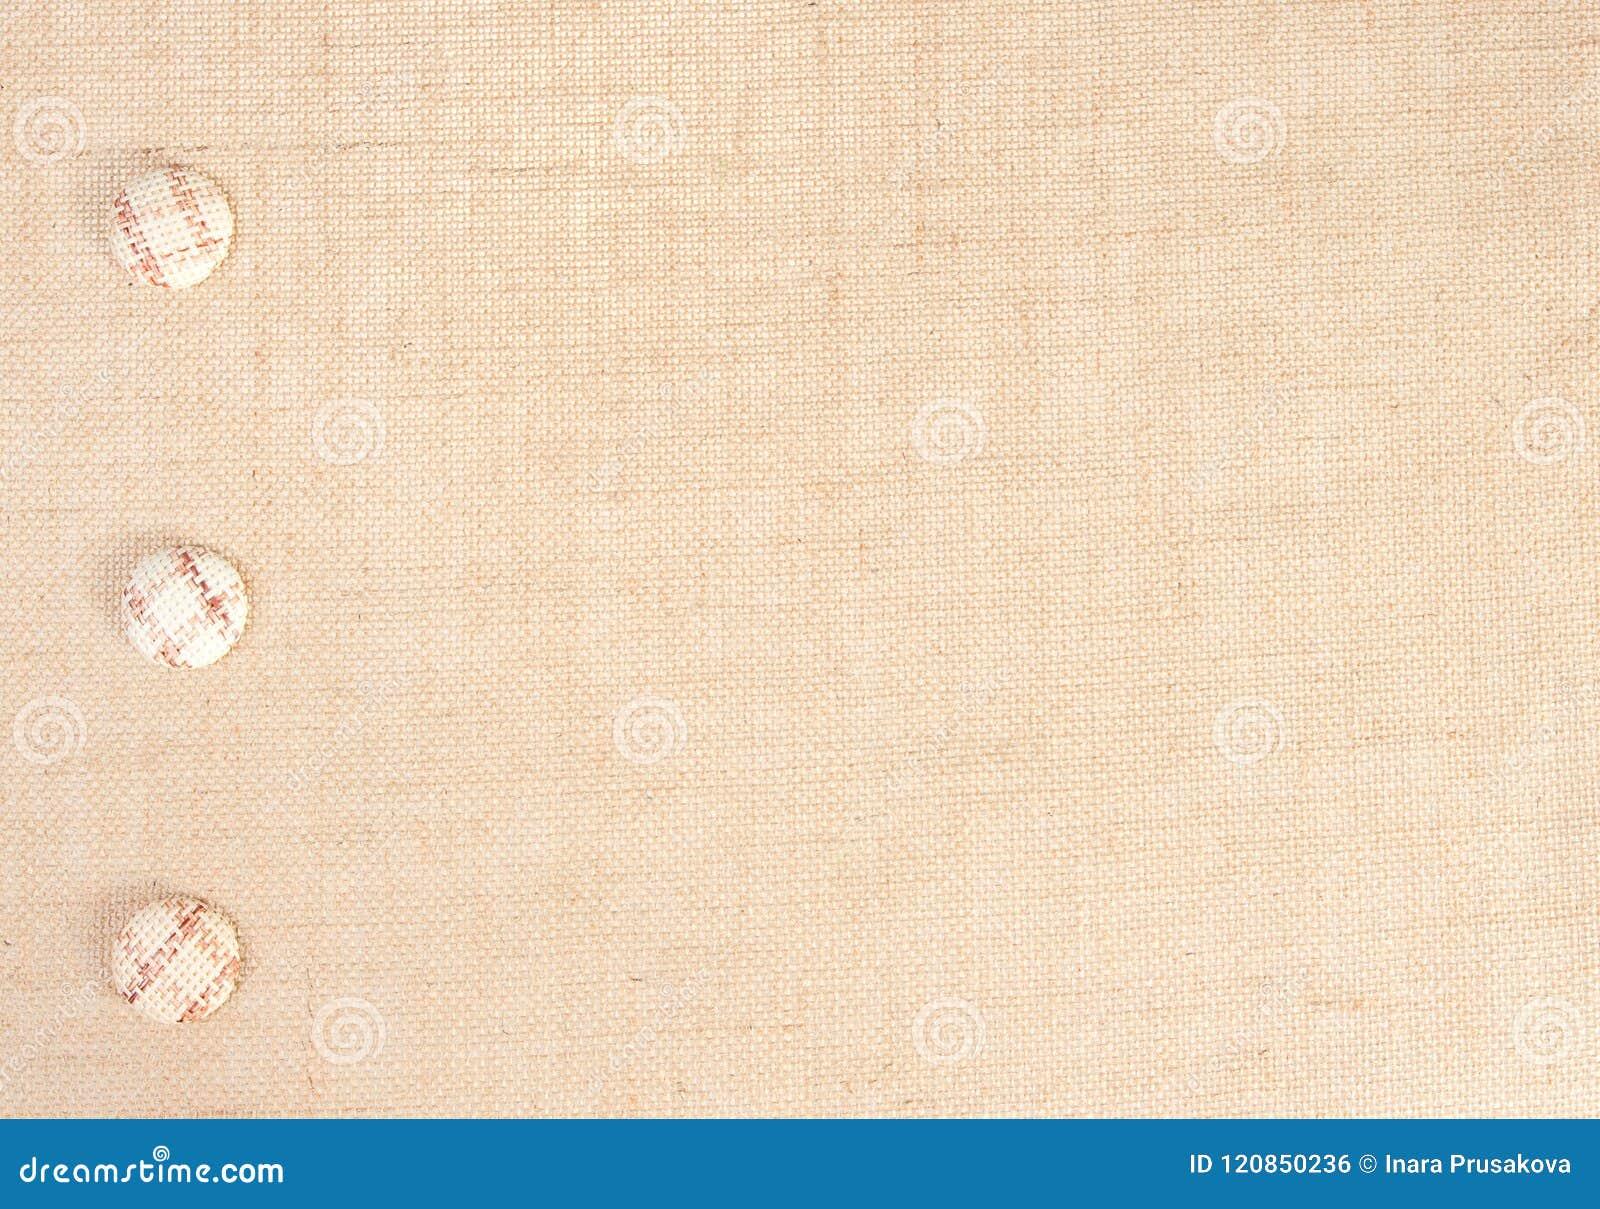 Sackcloth υπόβαθρο σύστασης υφάσματος και διακόσμηση κουμπιών, Burlap ύφασμα σάκων